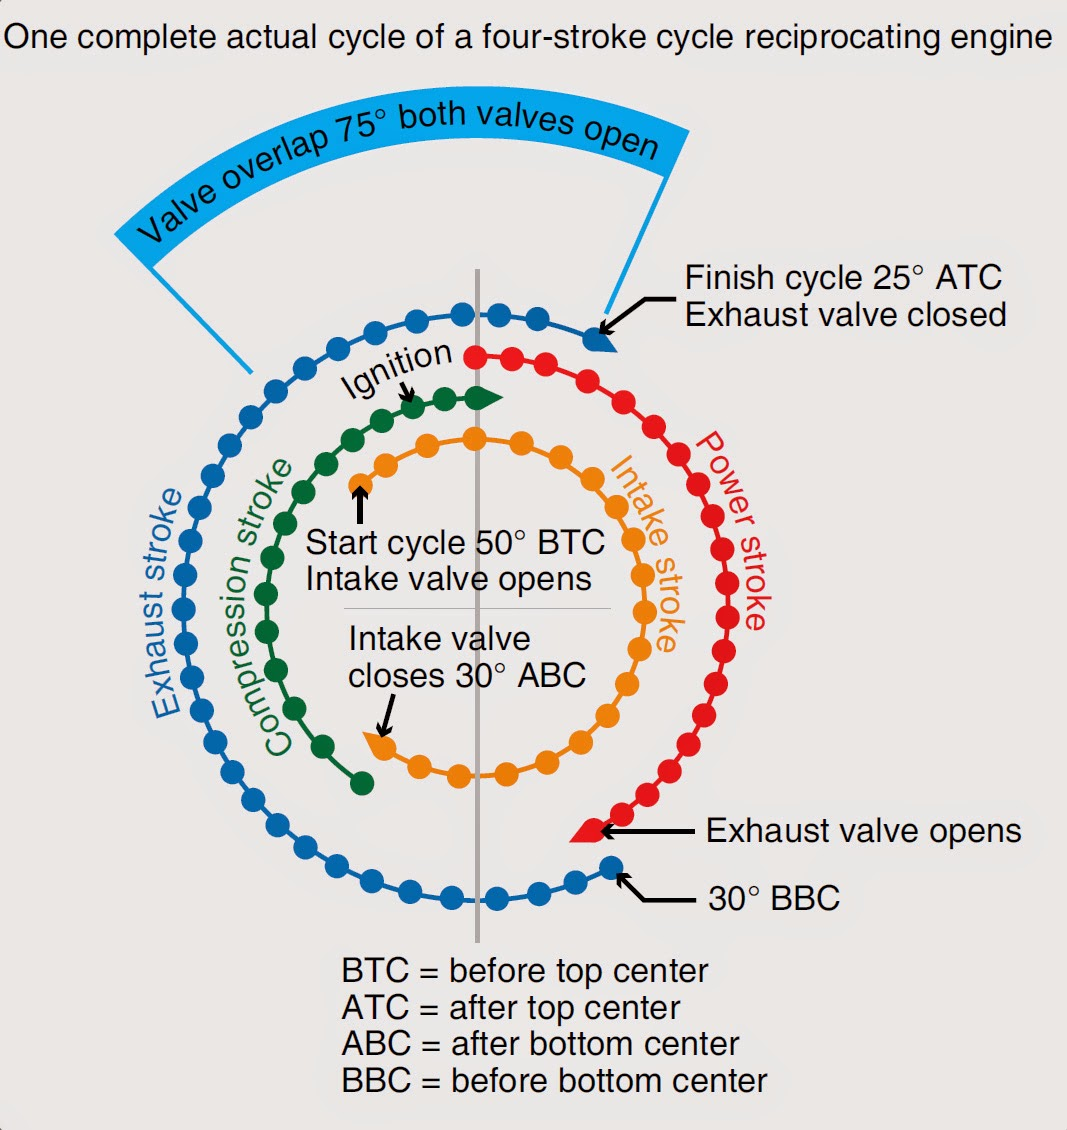 piston aircraft engine valve timing diagram wiring library piston aircraft engine valve timing diagram [ 1067 x 1130 Pixel ]